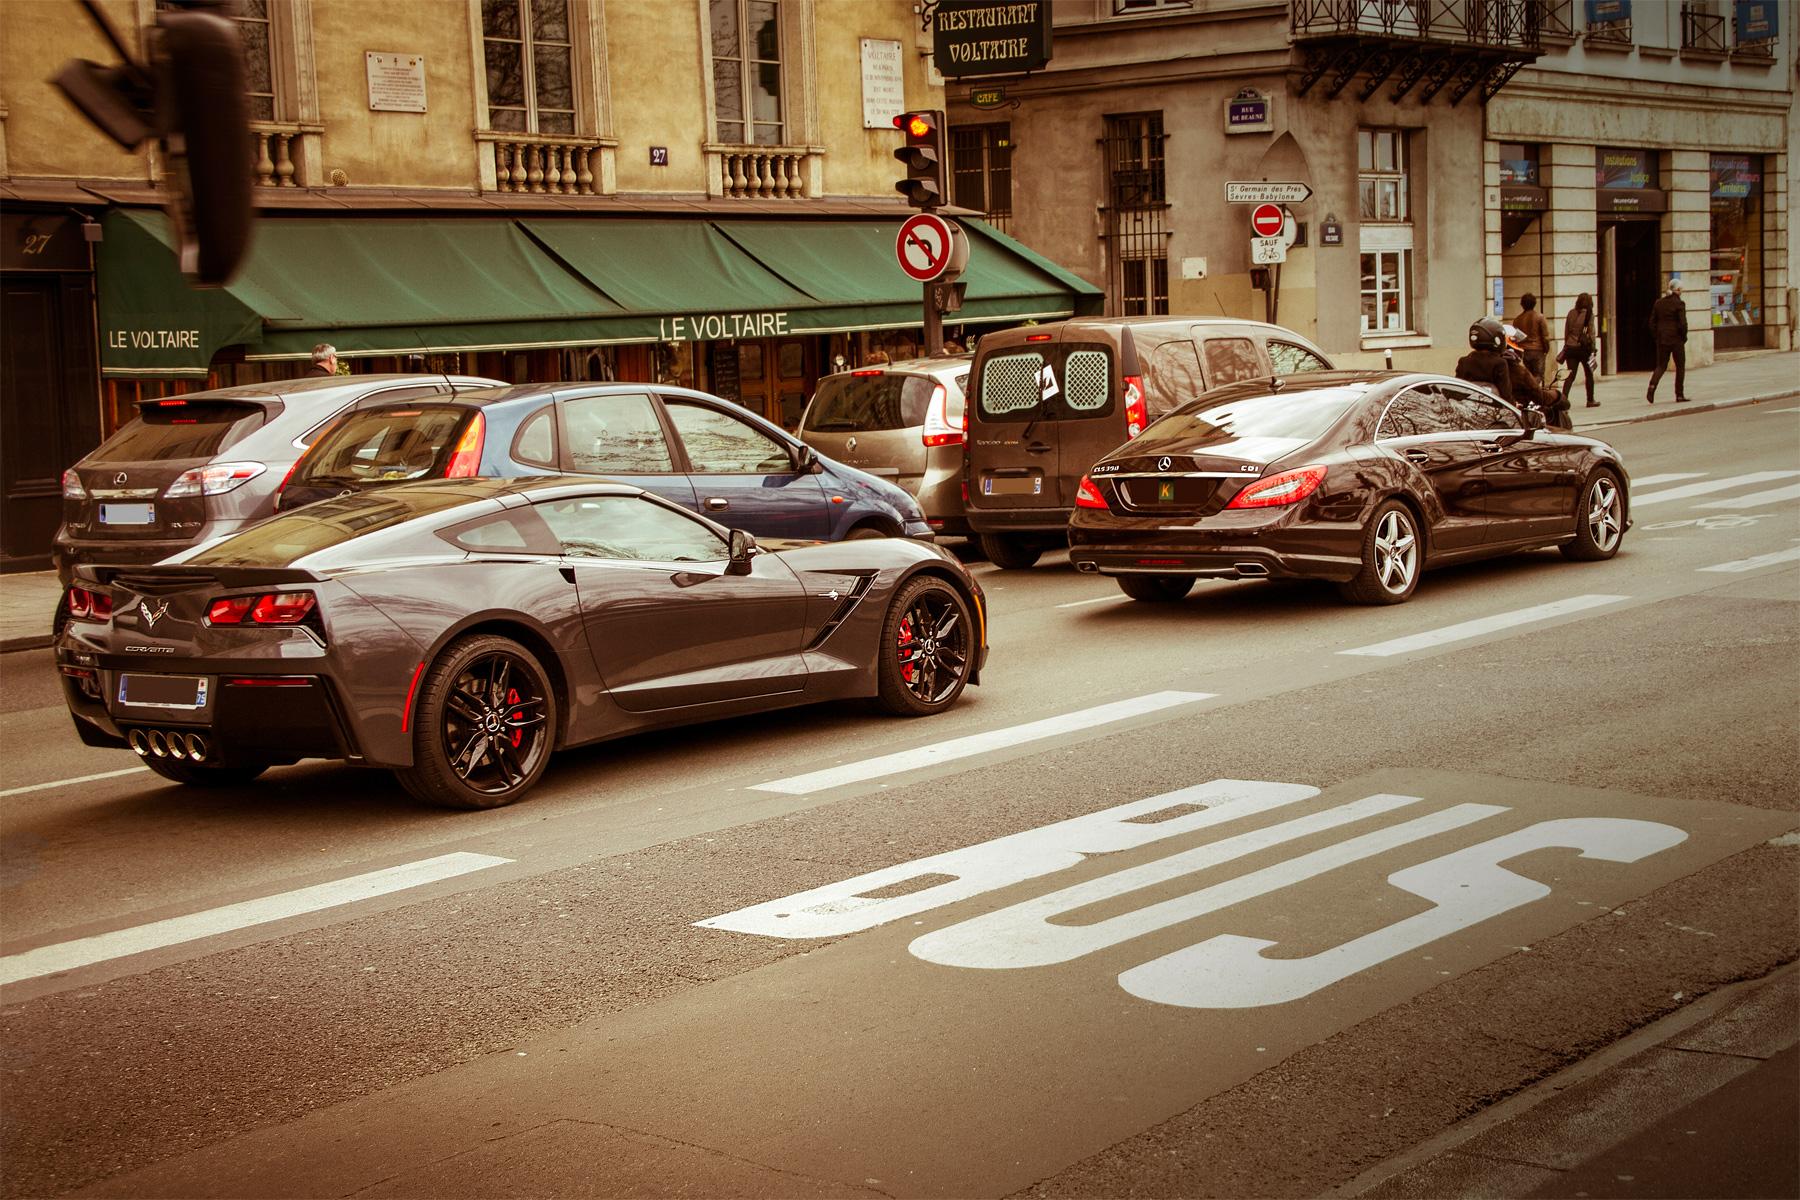 cars-paris-after.jpg